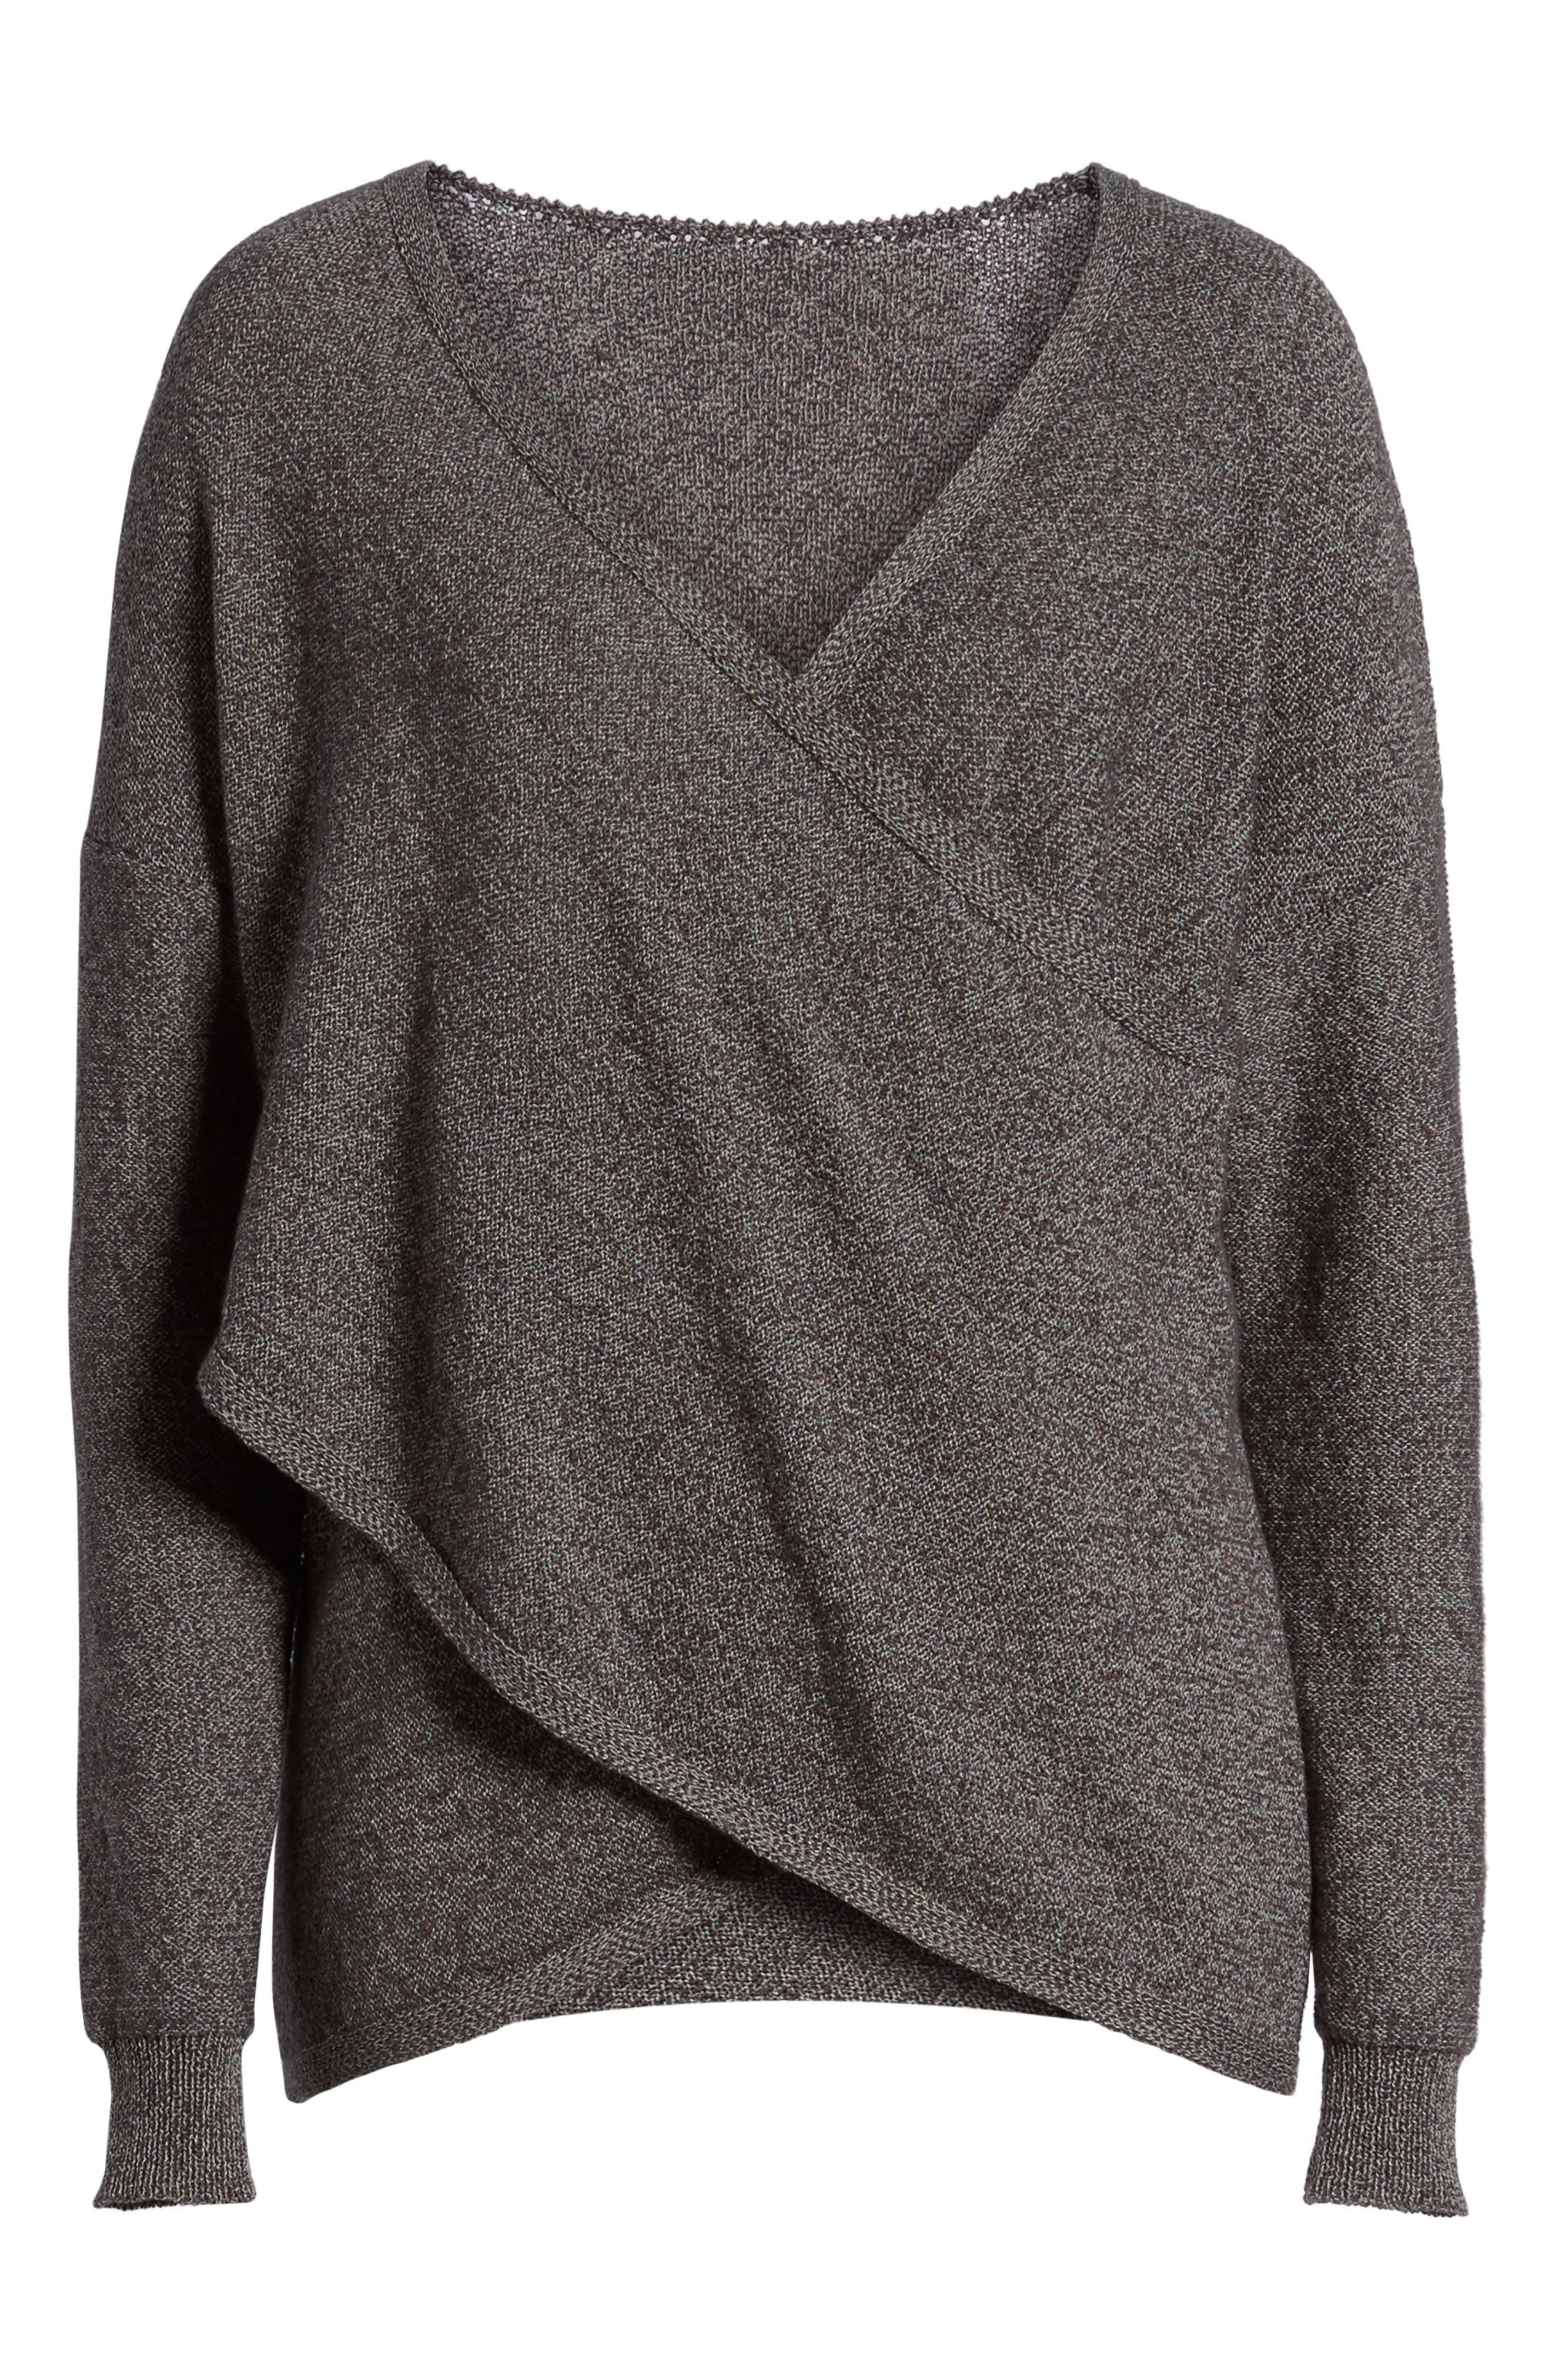 Lunar Surplice Sweater,                             Alternate thumbnail 6, color,                             020